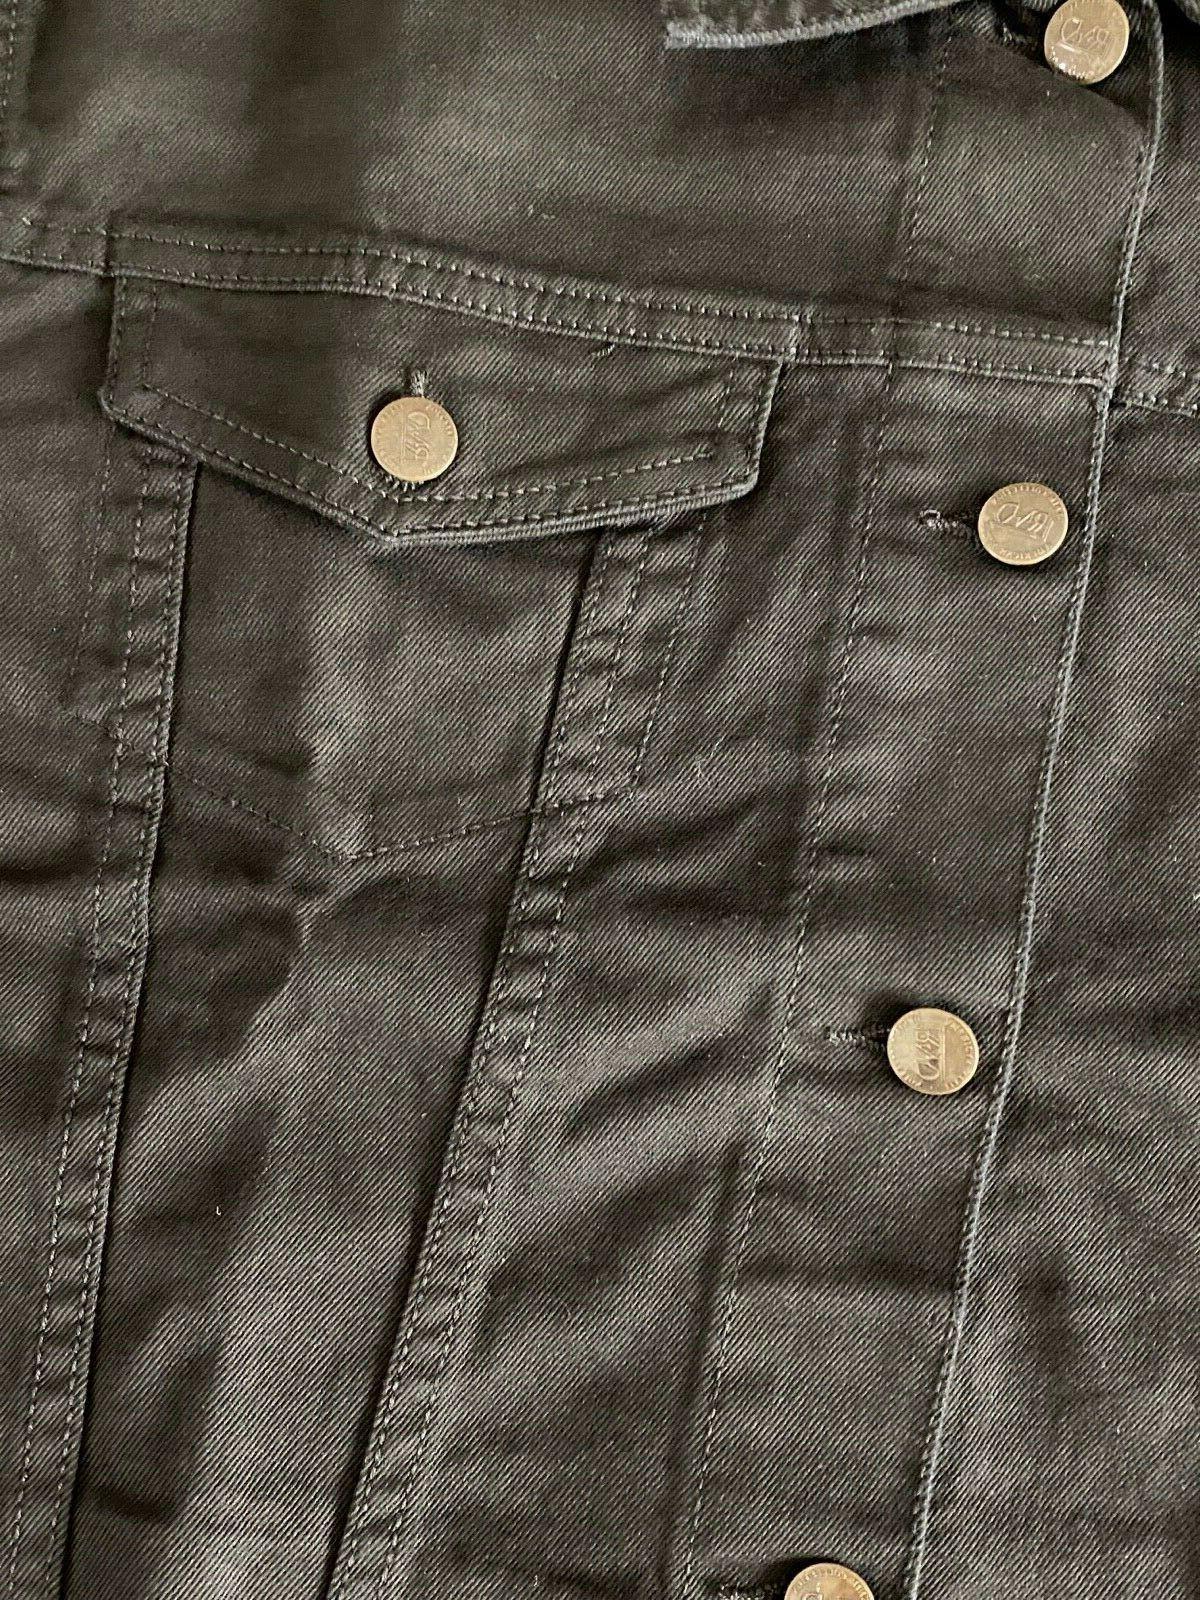 NWT RND Classic Black Denim Jacket SIZES S-2XL